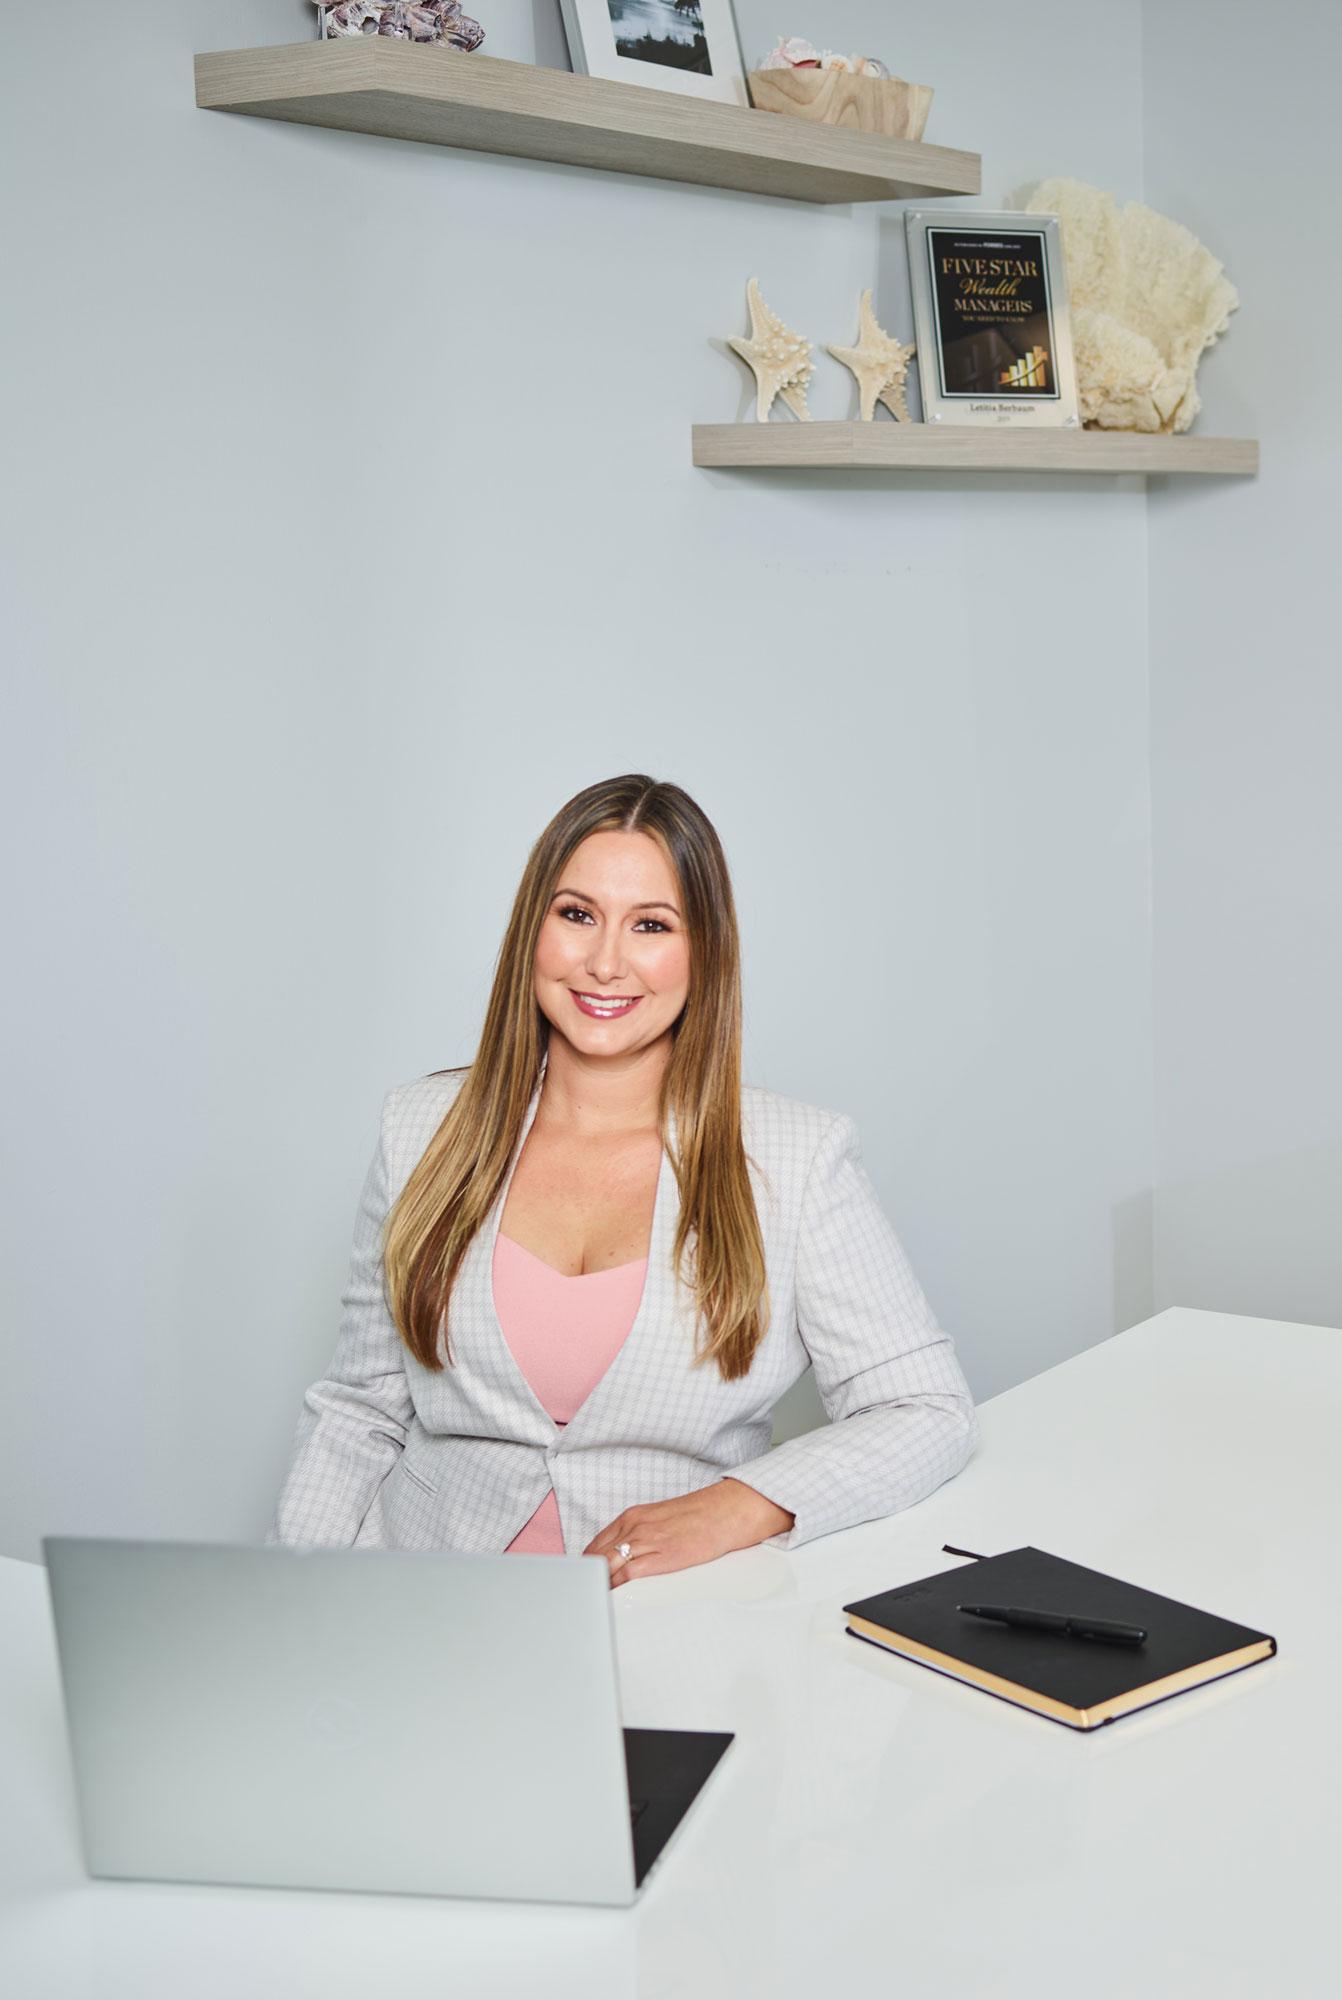 Letitia Berbaum sitting at her desk